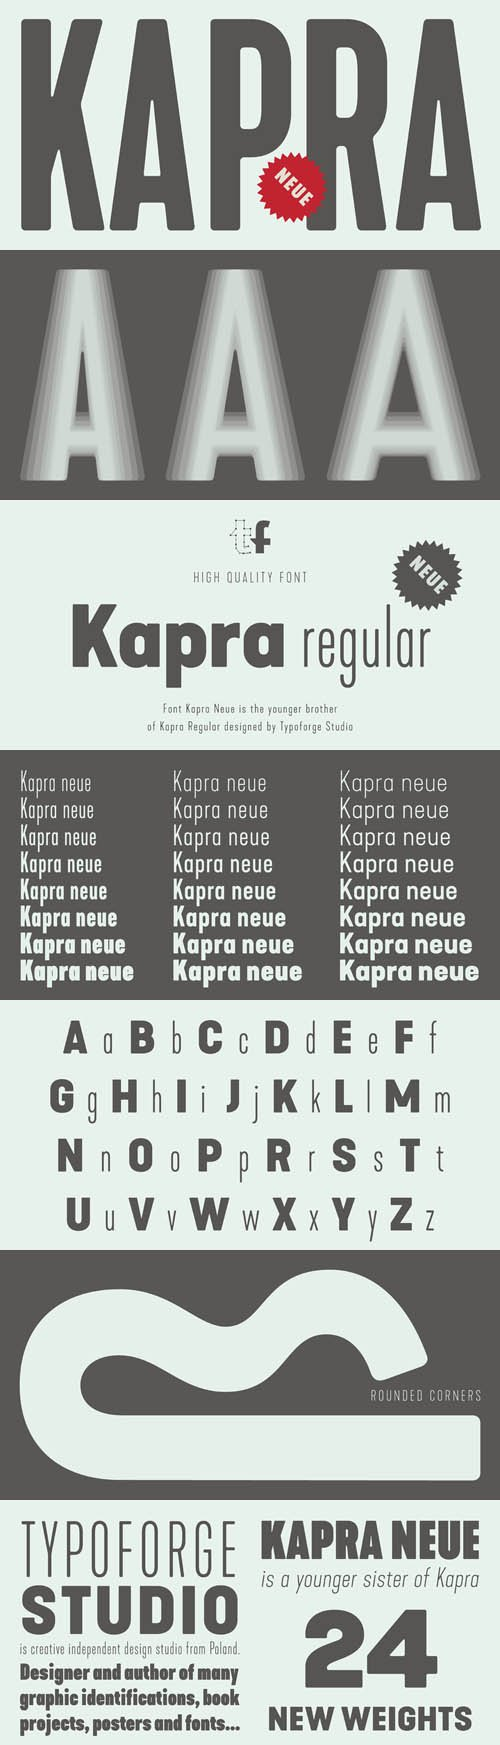 Kapra Neue font family